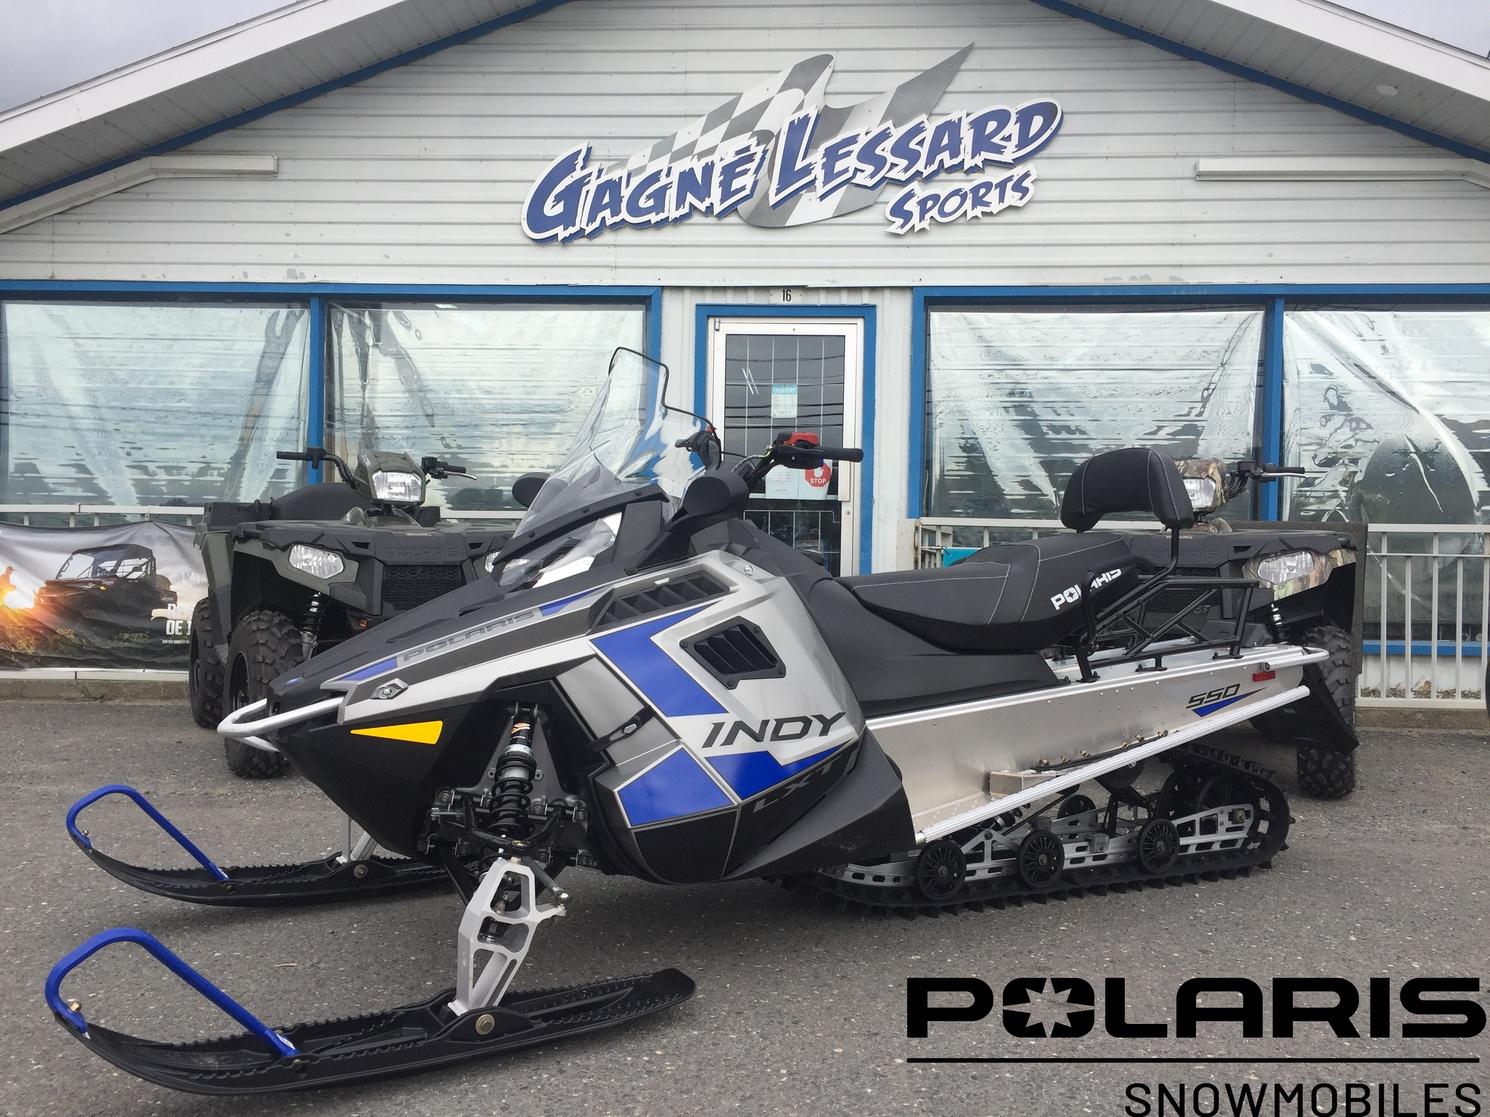 2021 Polaris 550 INDY LXT ES NRTH ED